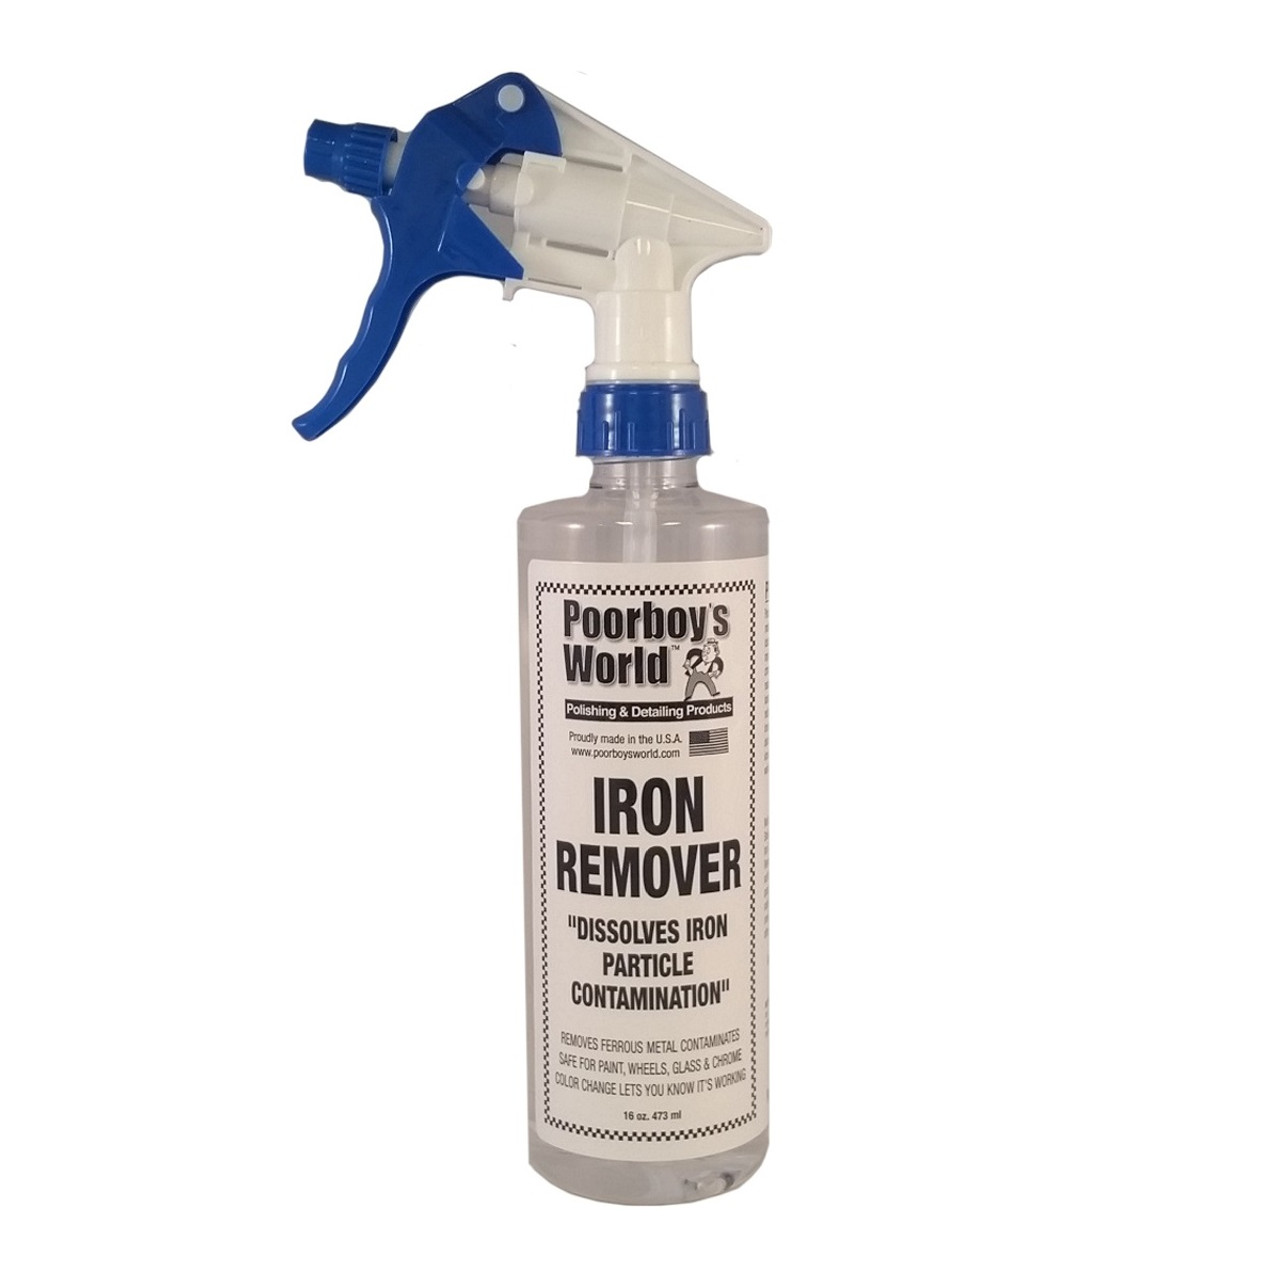 Poorboy's World Iron Remover 16oz w/Sprayer